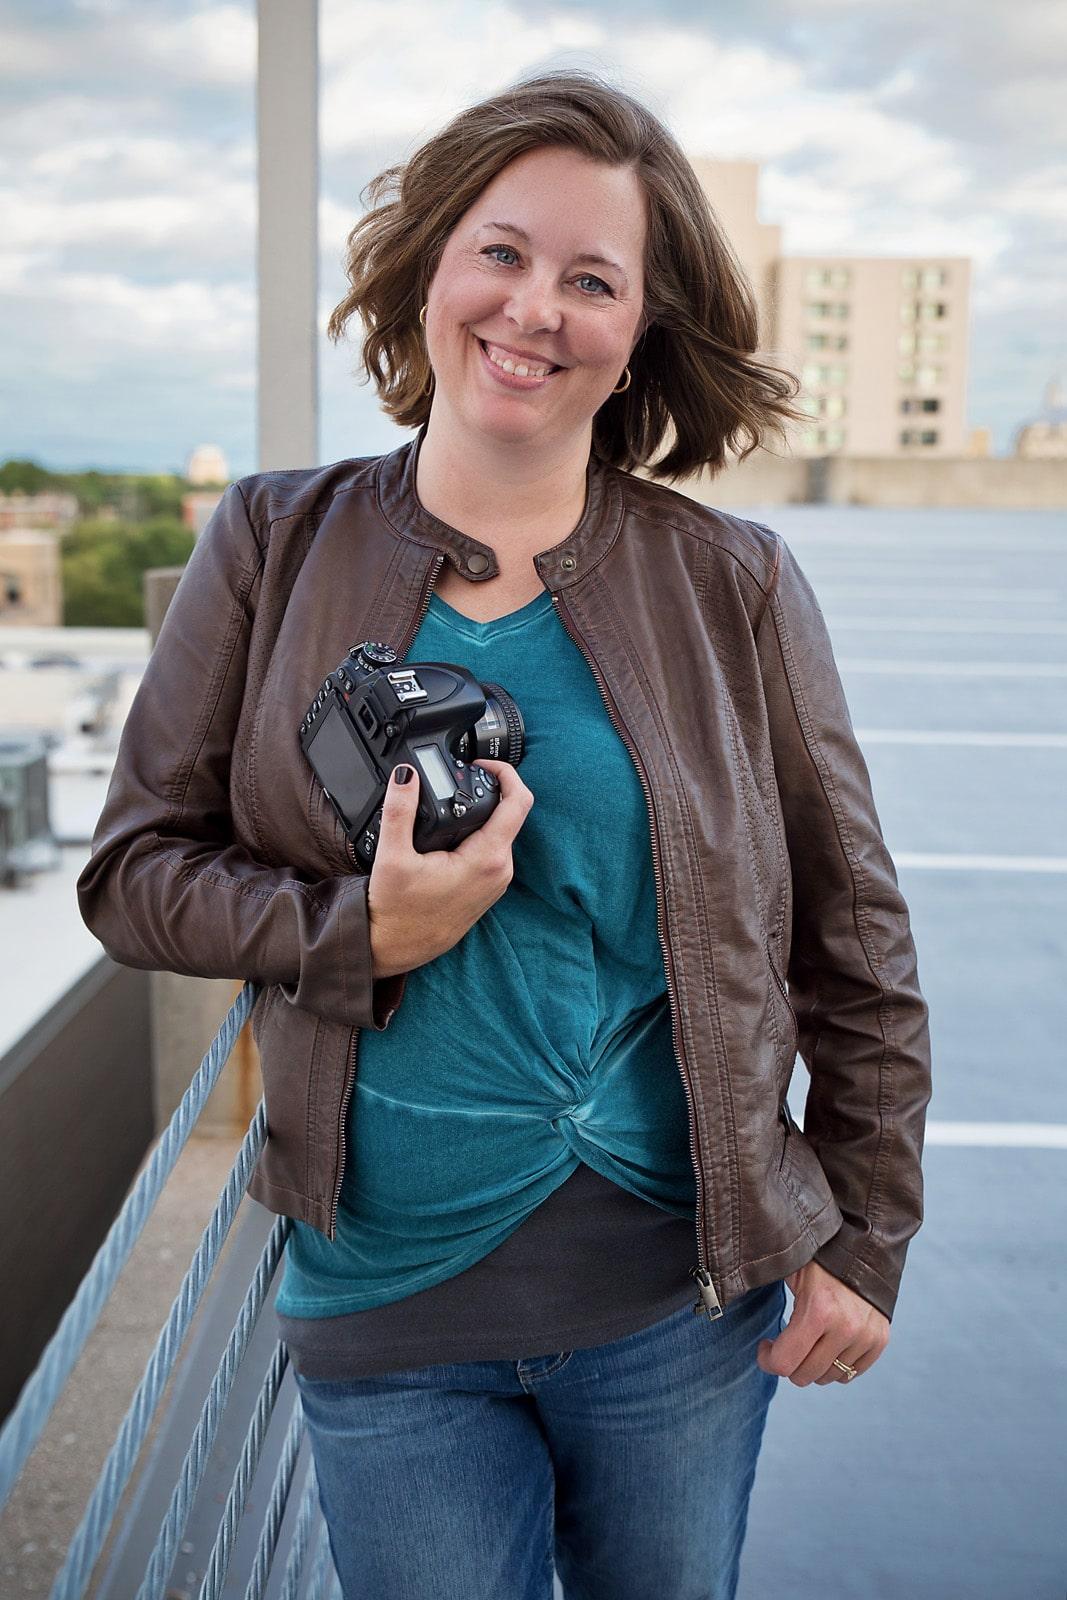 Photographer Katherine Pittman